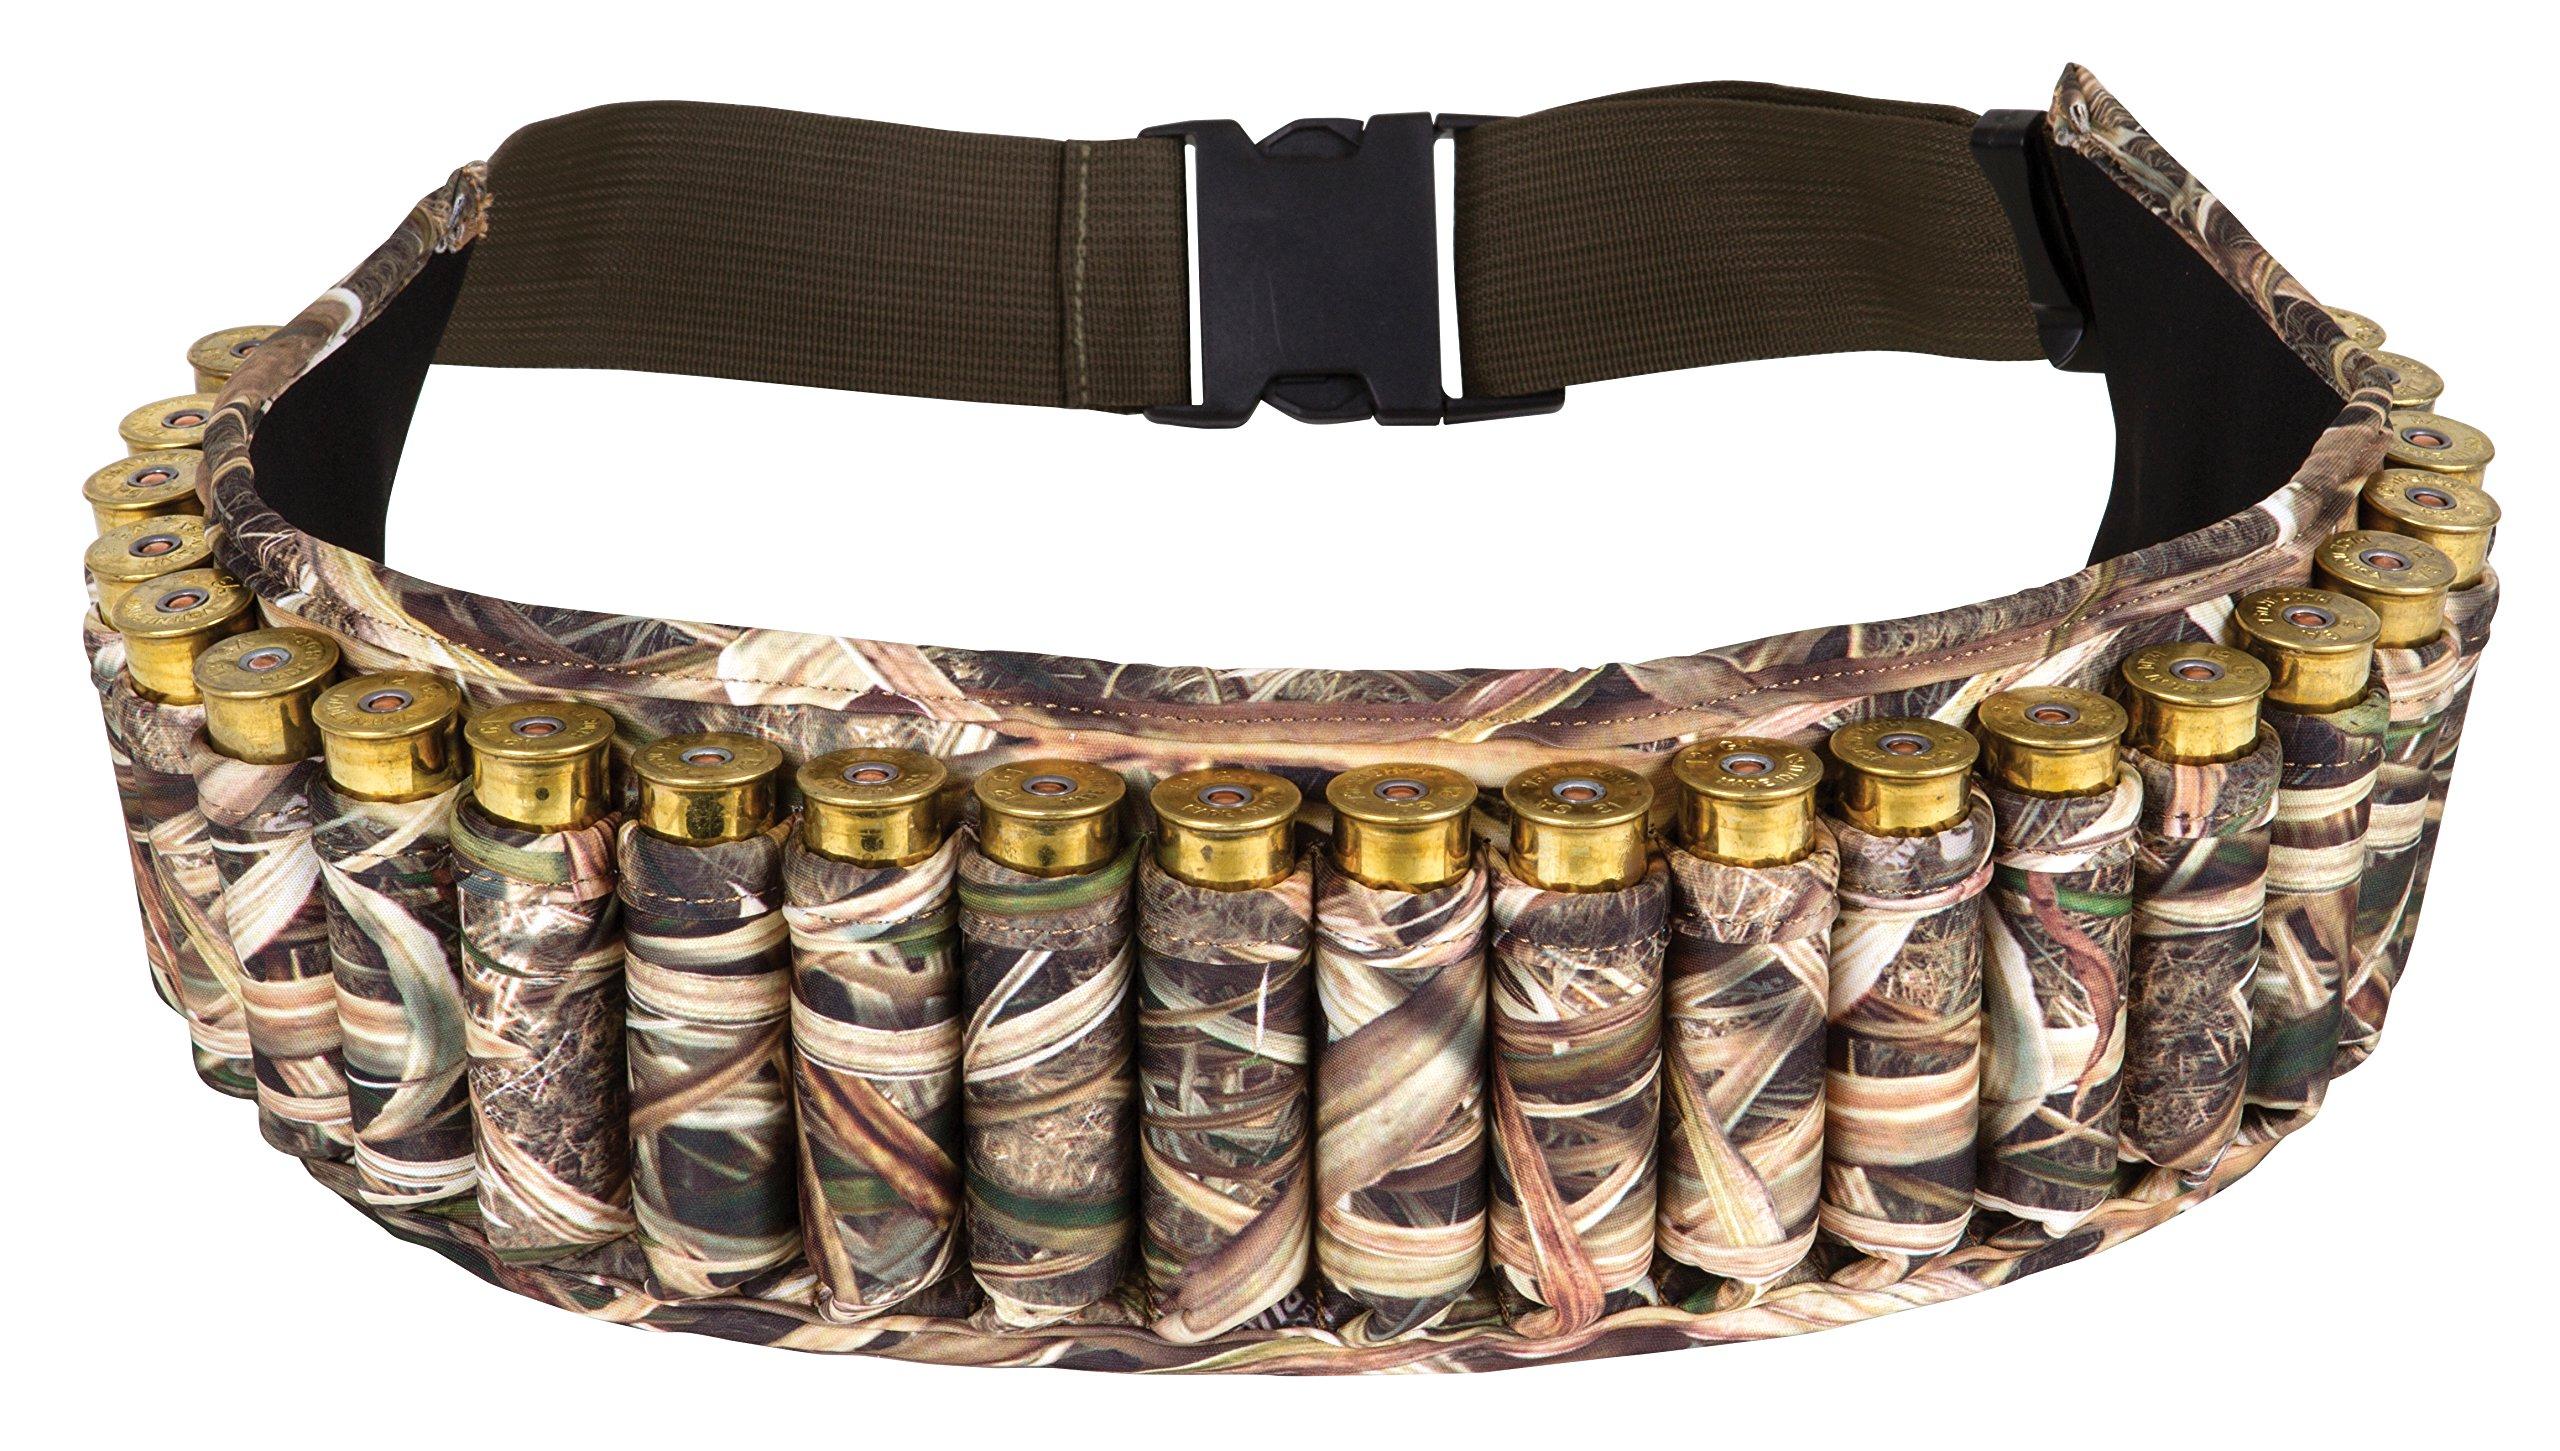 Flambeau Outdoors Neoprene Shotshell Belt - (25) Rounds, One Size